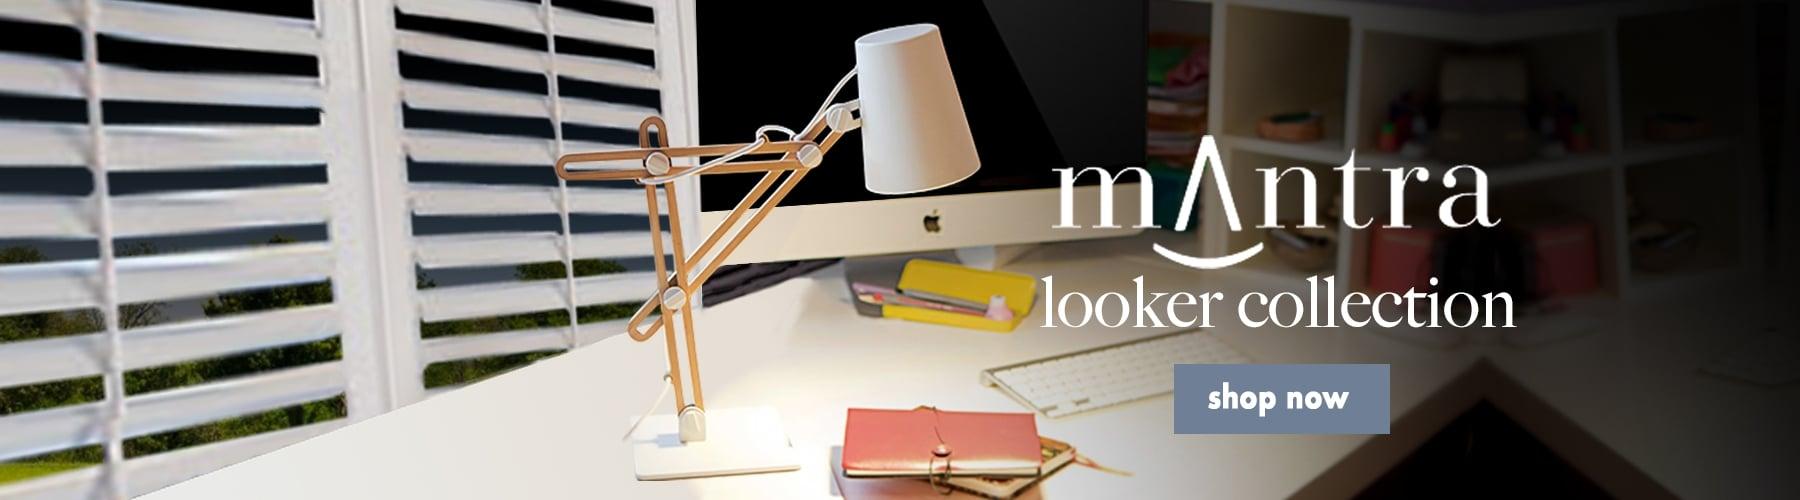 Mantra Looker